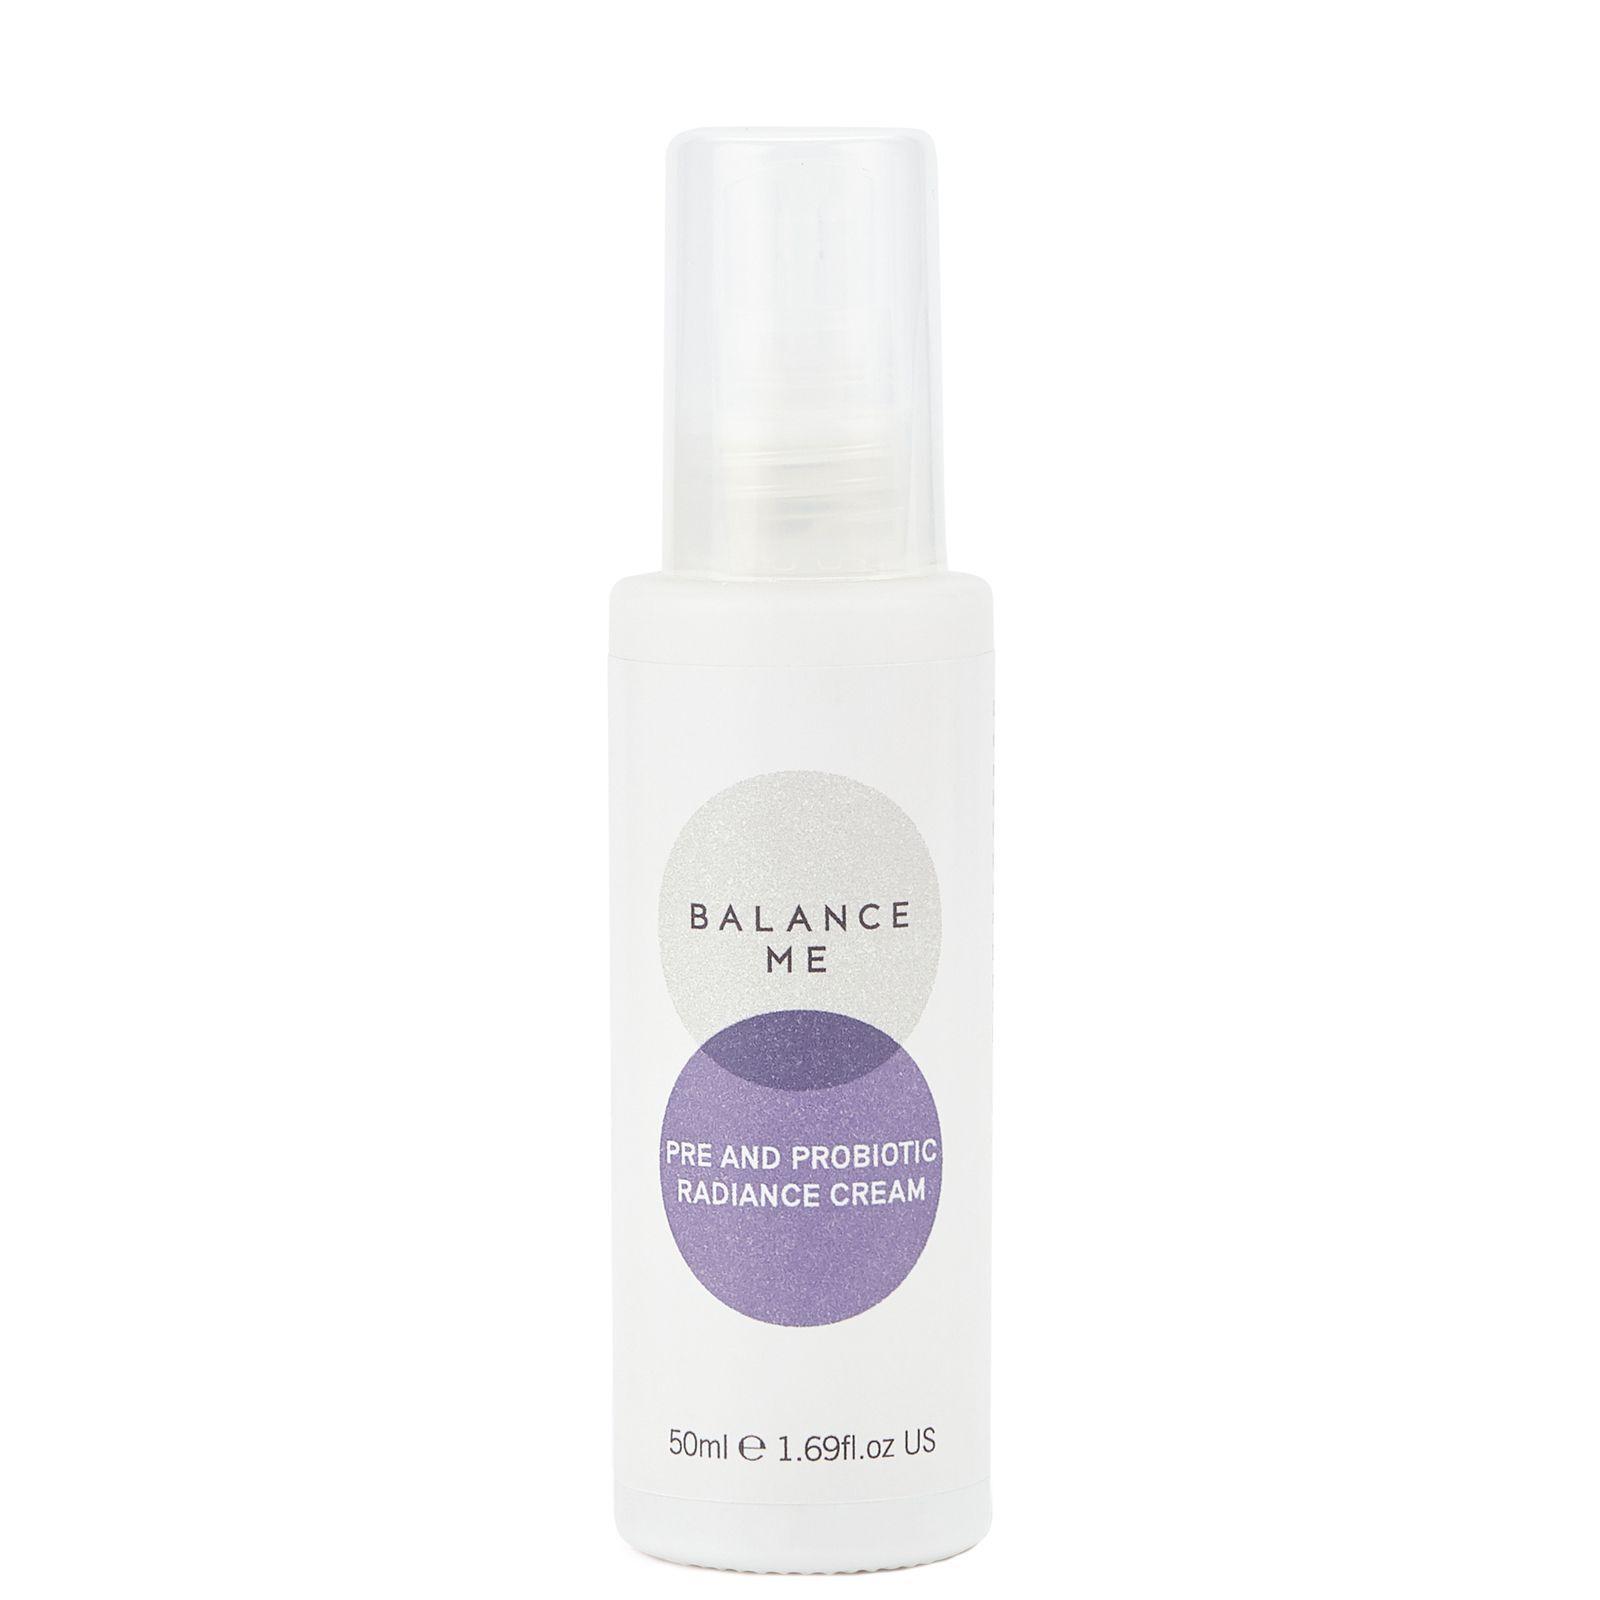 Balance Me - Radiance Pre & Probiotic Radiance Cream 50ml for Women